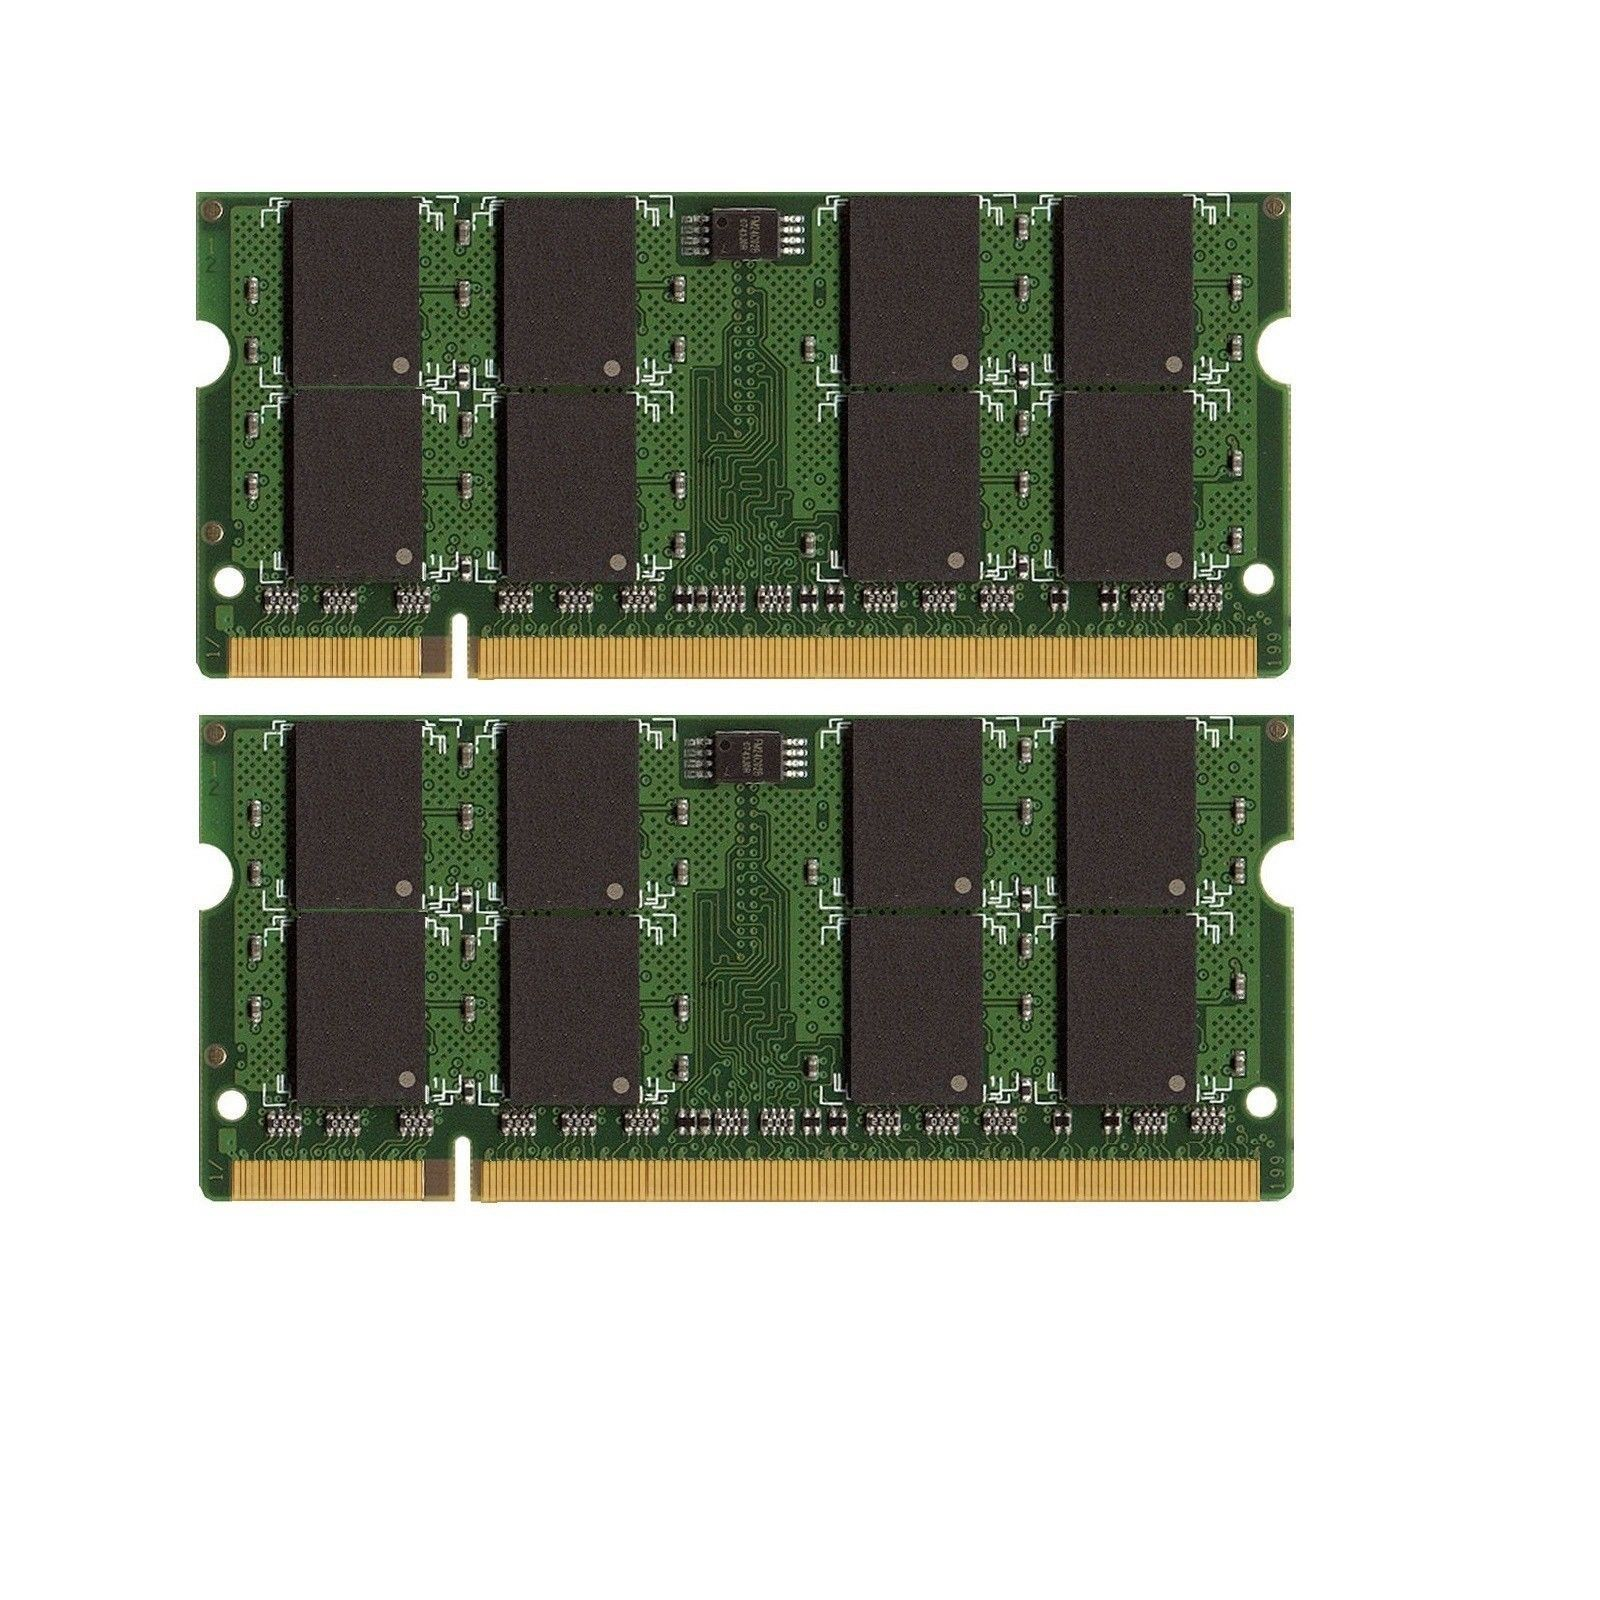 8GB (2X4GB) COMPAT TO M471B5273DH0-CH9 MV-3T4G4/US - $109.99